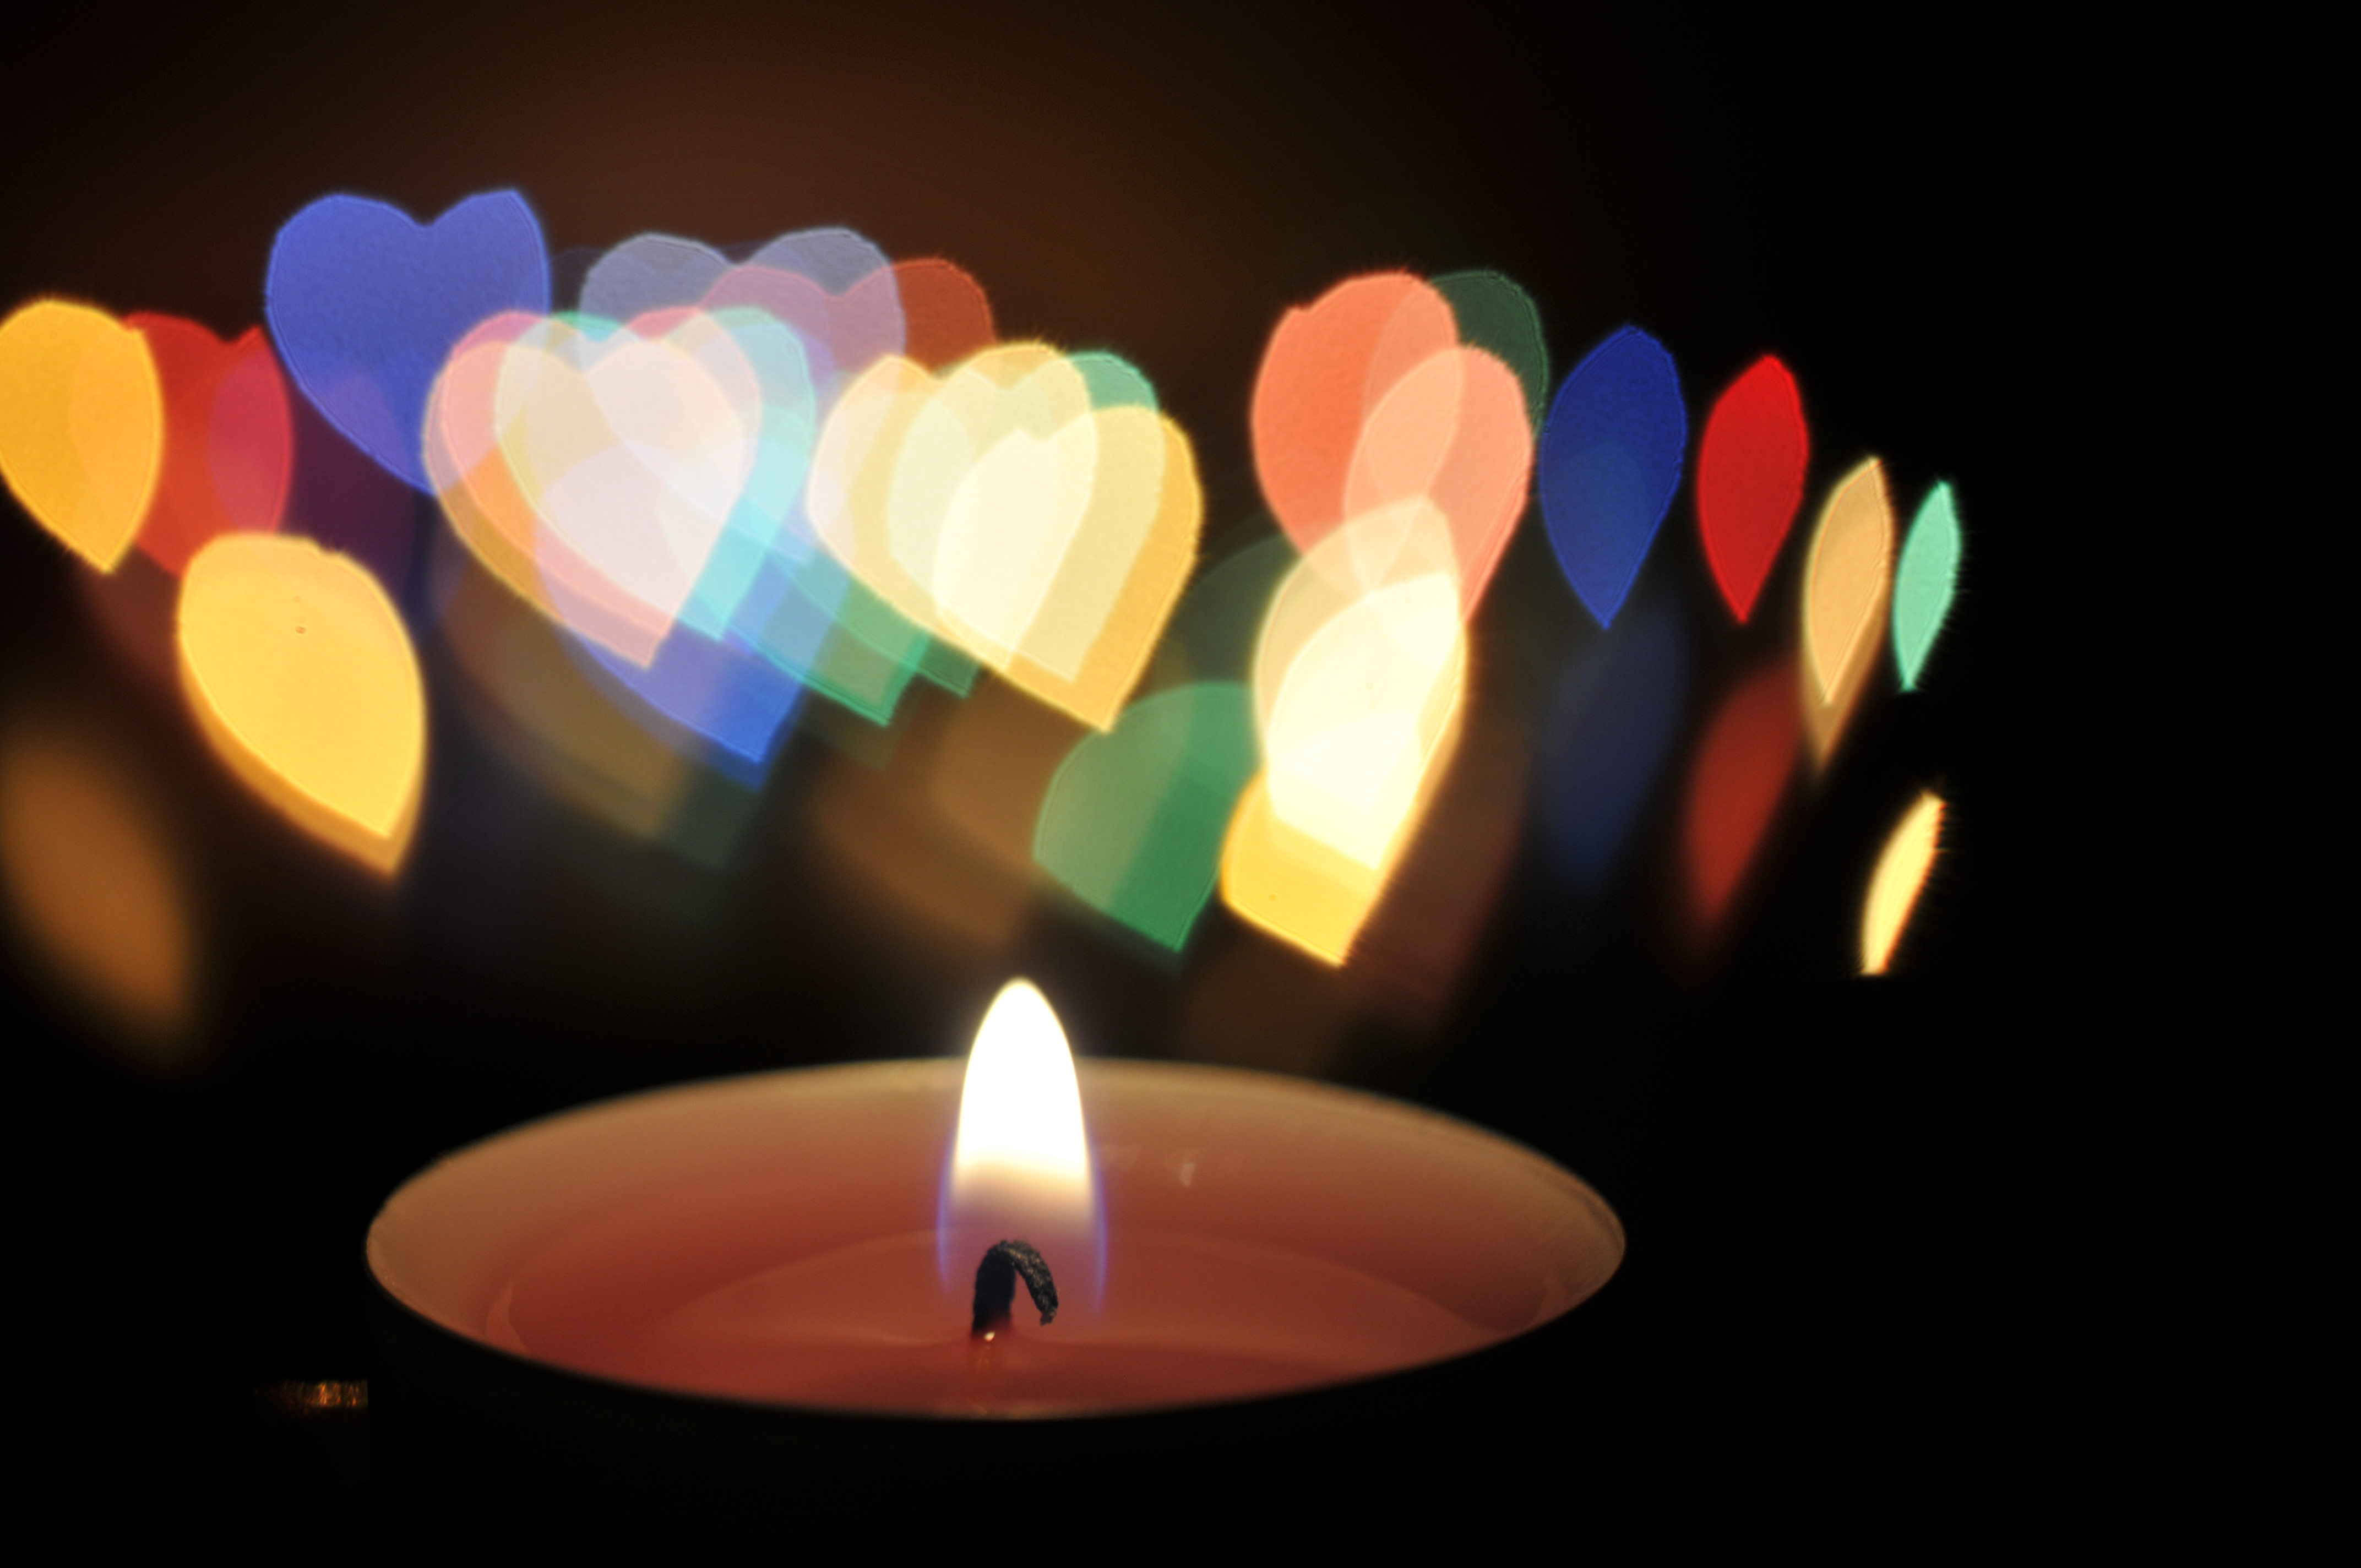 Amor Segundo Filósofos: Porque Ainda Acredito No Amor…